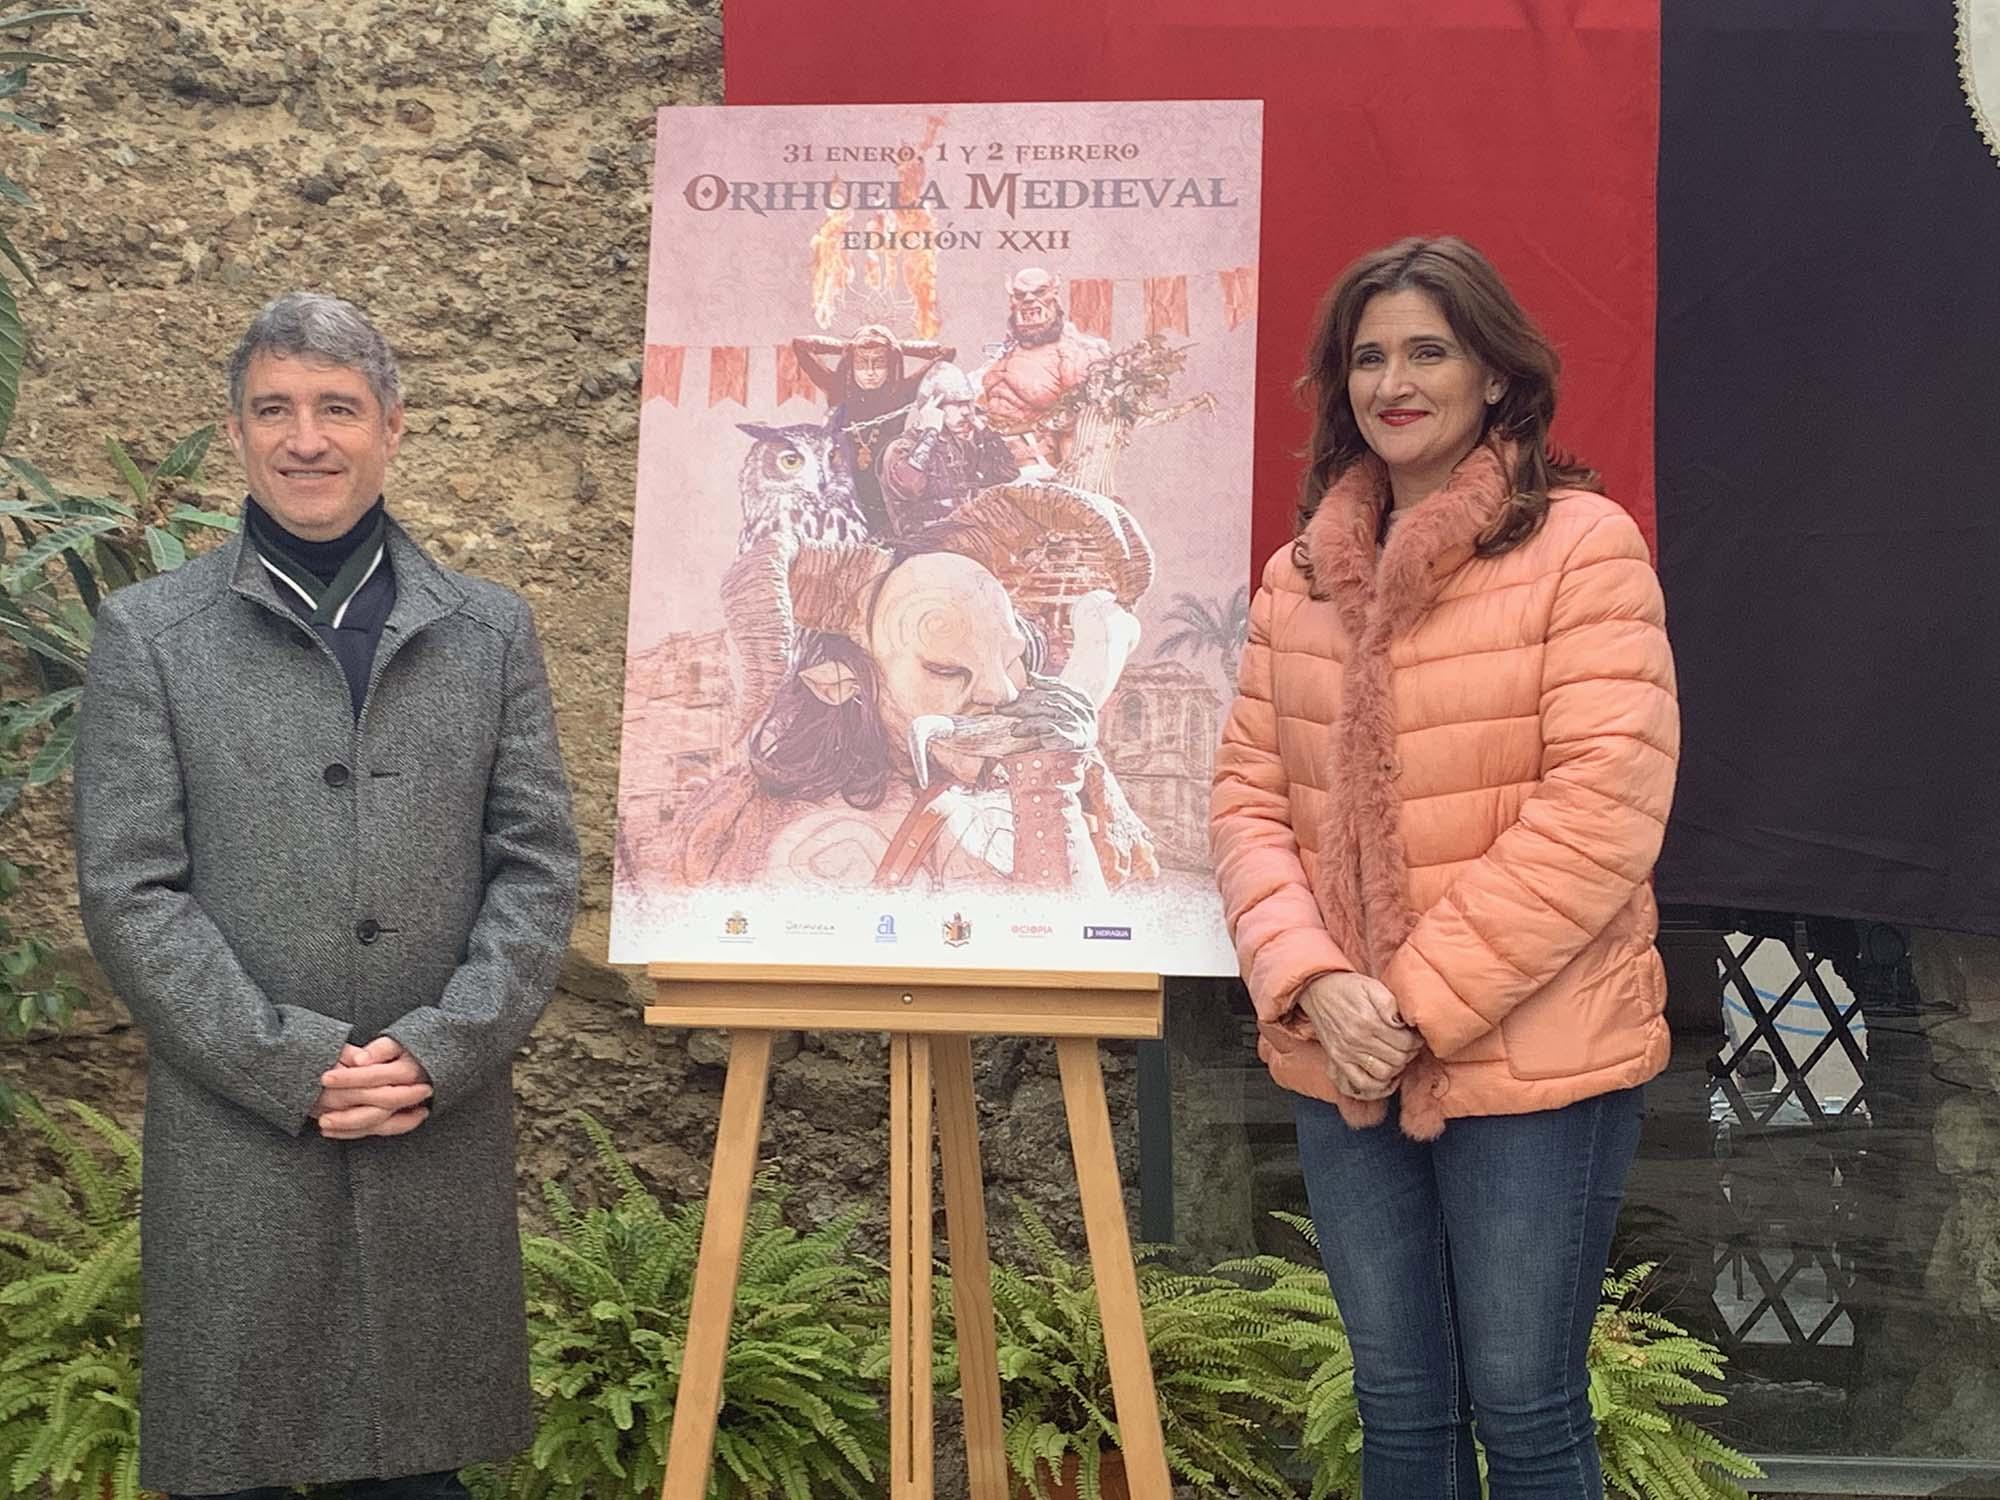 Medieval Market gets underway in Orihuela on Friday